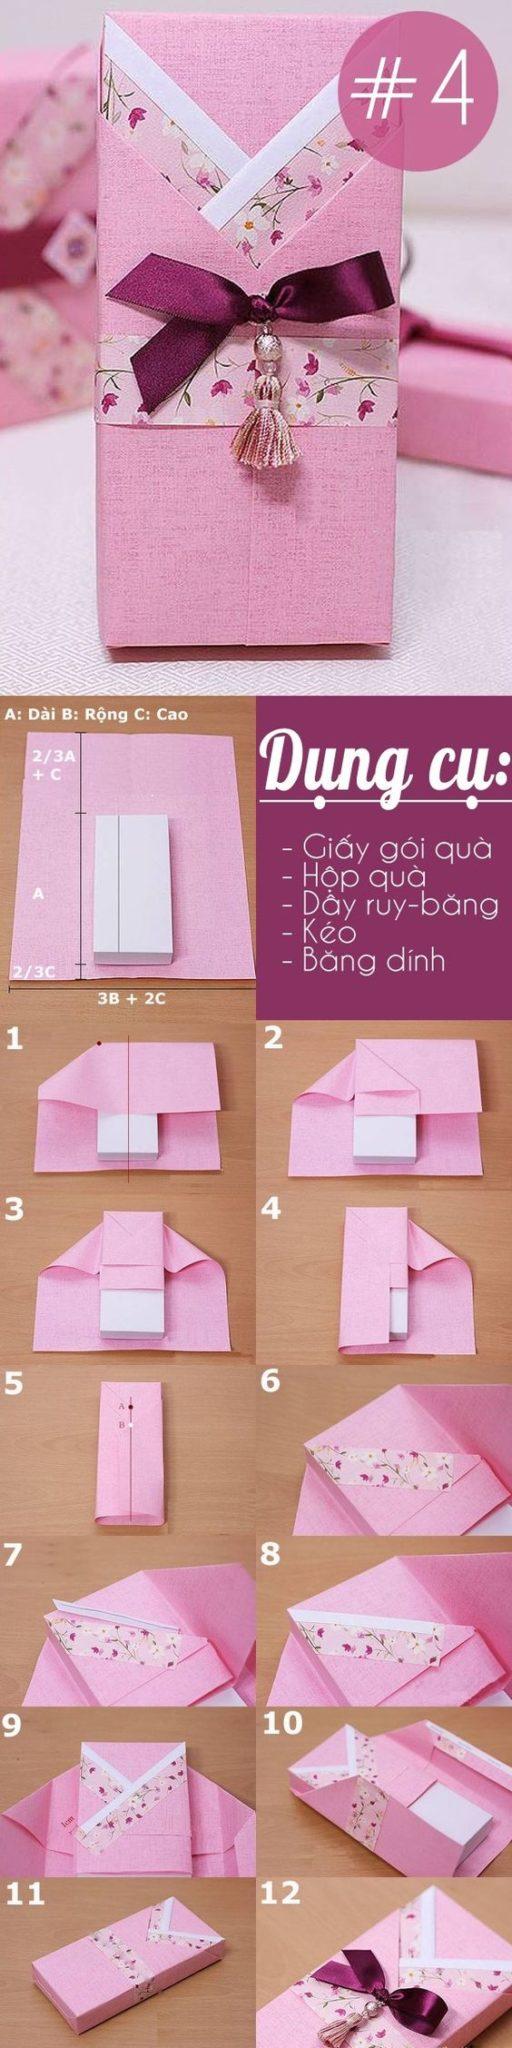 Envuelve un regalo con cintas de washi tape